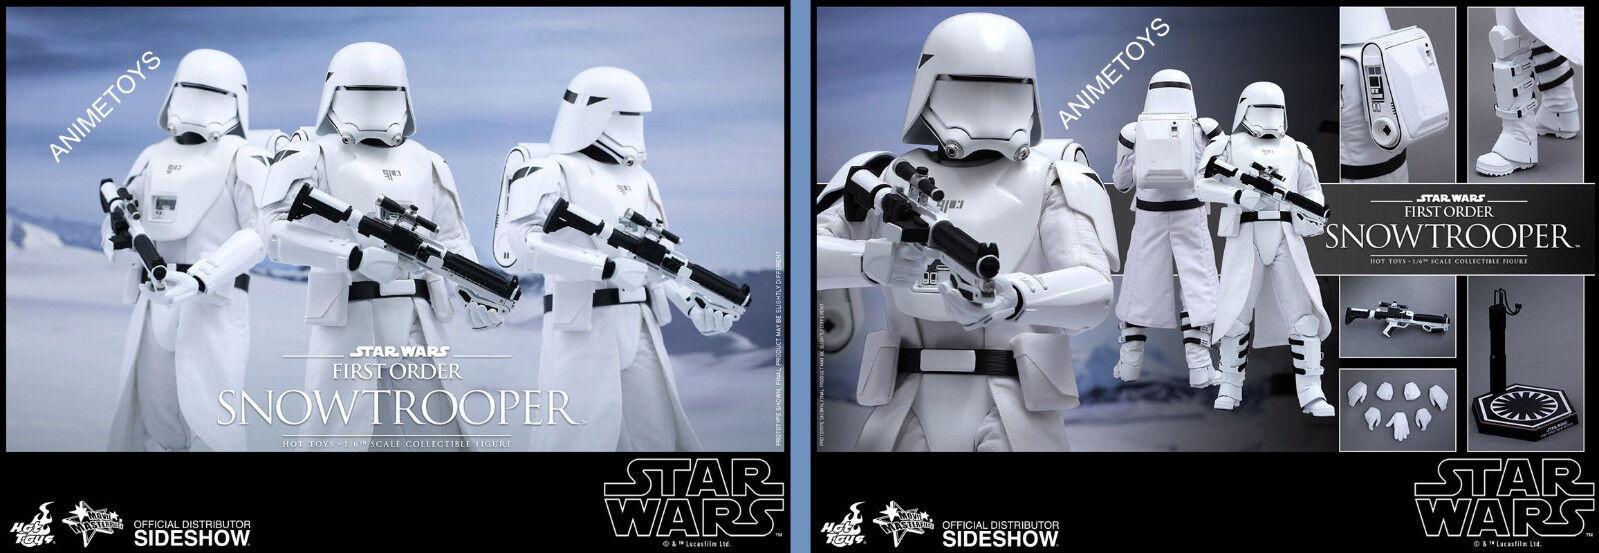 HOT TOYS – STAR WARS Episode VII – First Order Snowtrooper